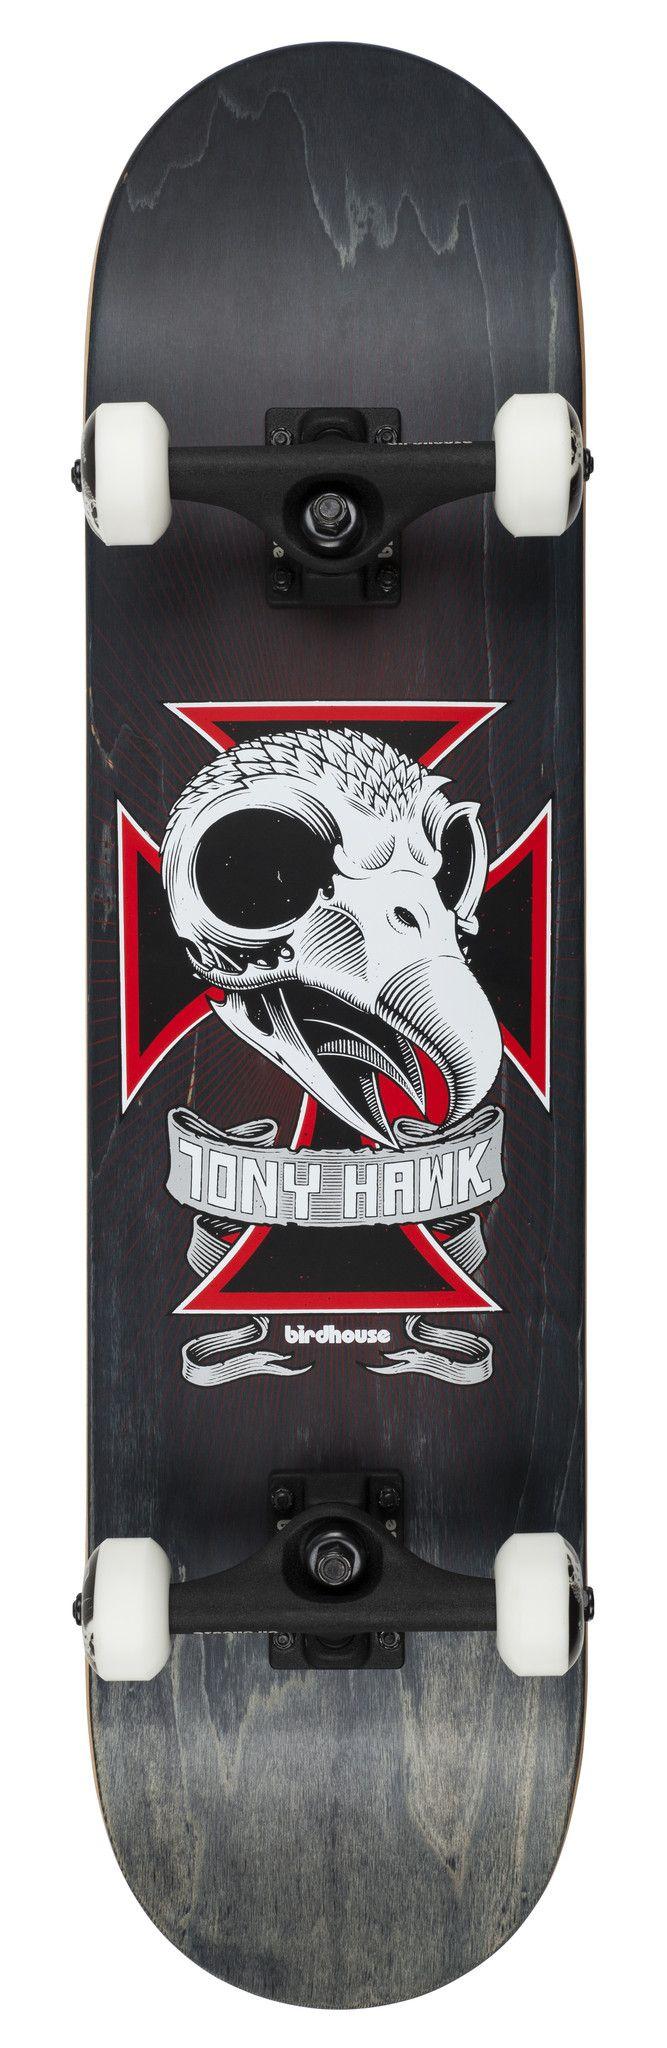 "Birdhouse Premium Quality Tony Hawk Complete Skateboard Skull 2 7.75"" #Skateboarding #TonyHawk"